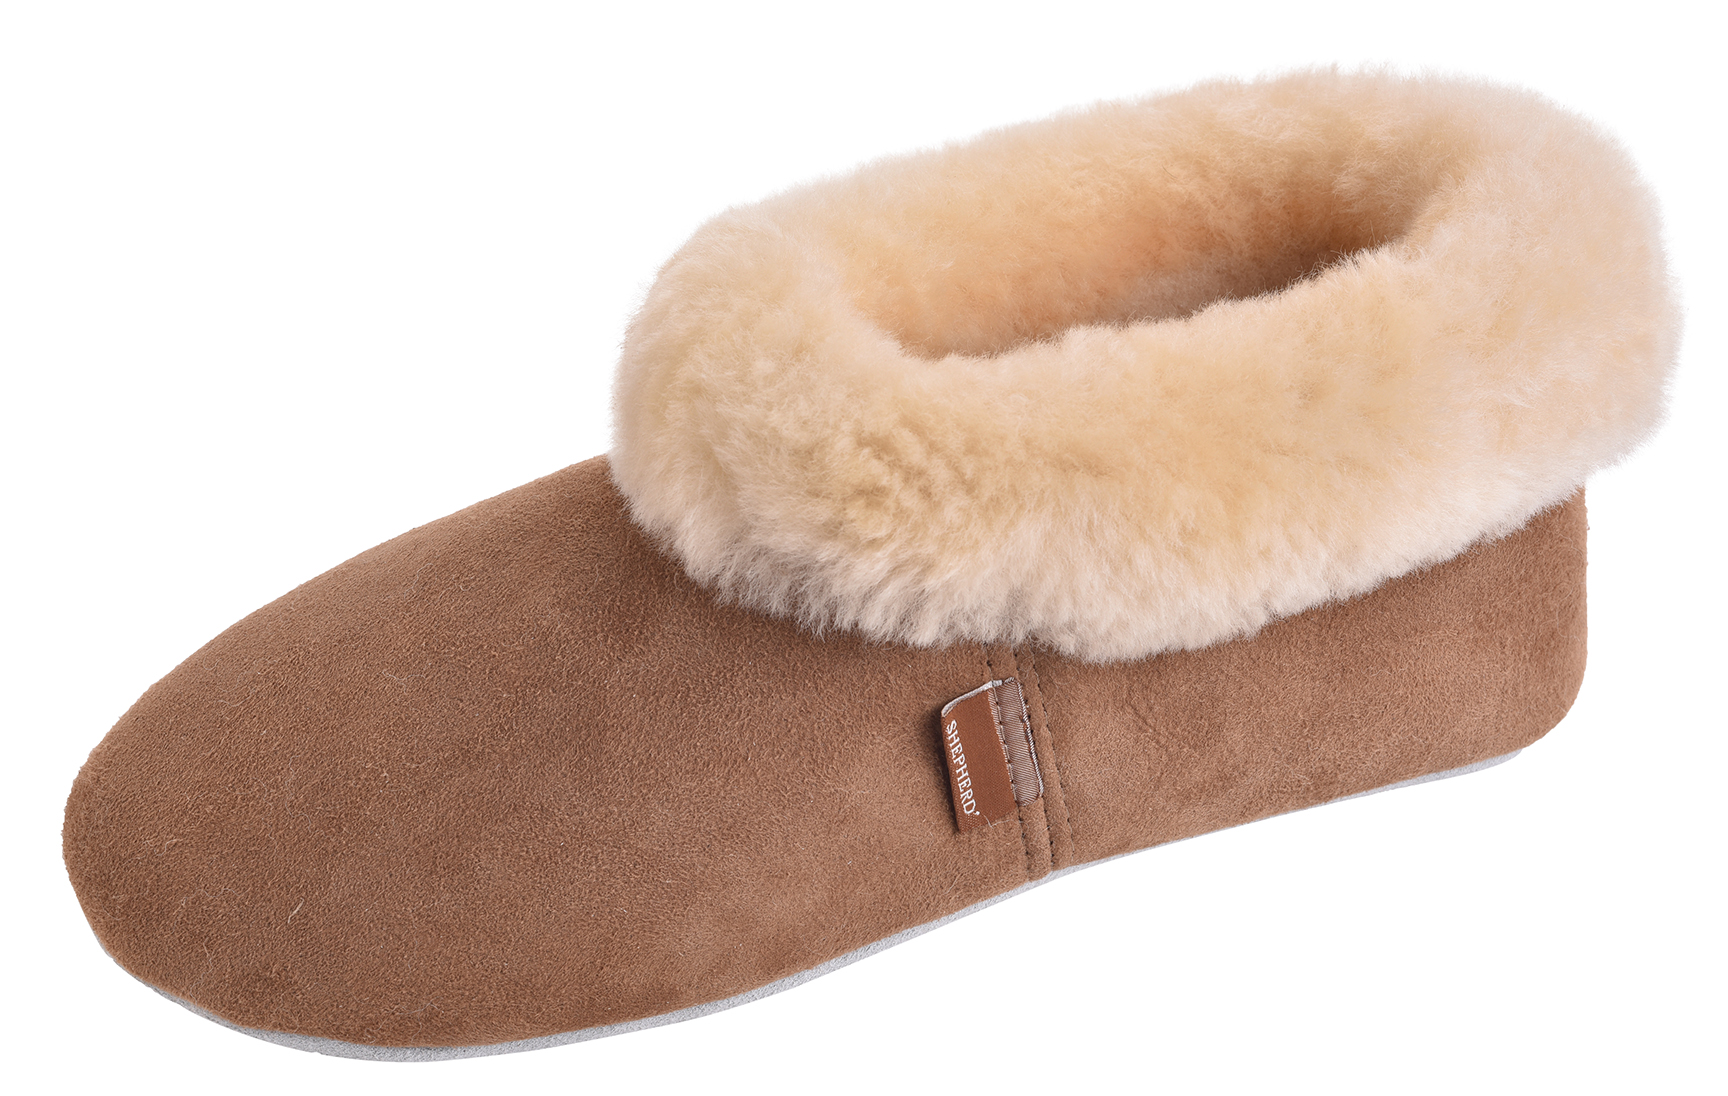 Tan Boot Cuff Uk5 Ladies Uk6 Genuine Rolled Slipper Sheepskin Suede Sole Womens tqIRwzW